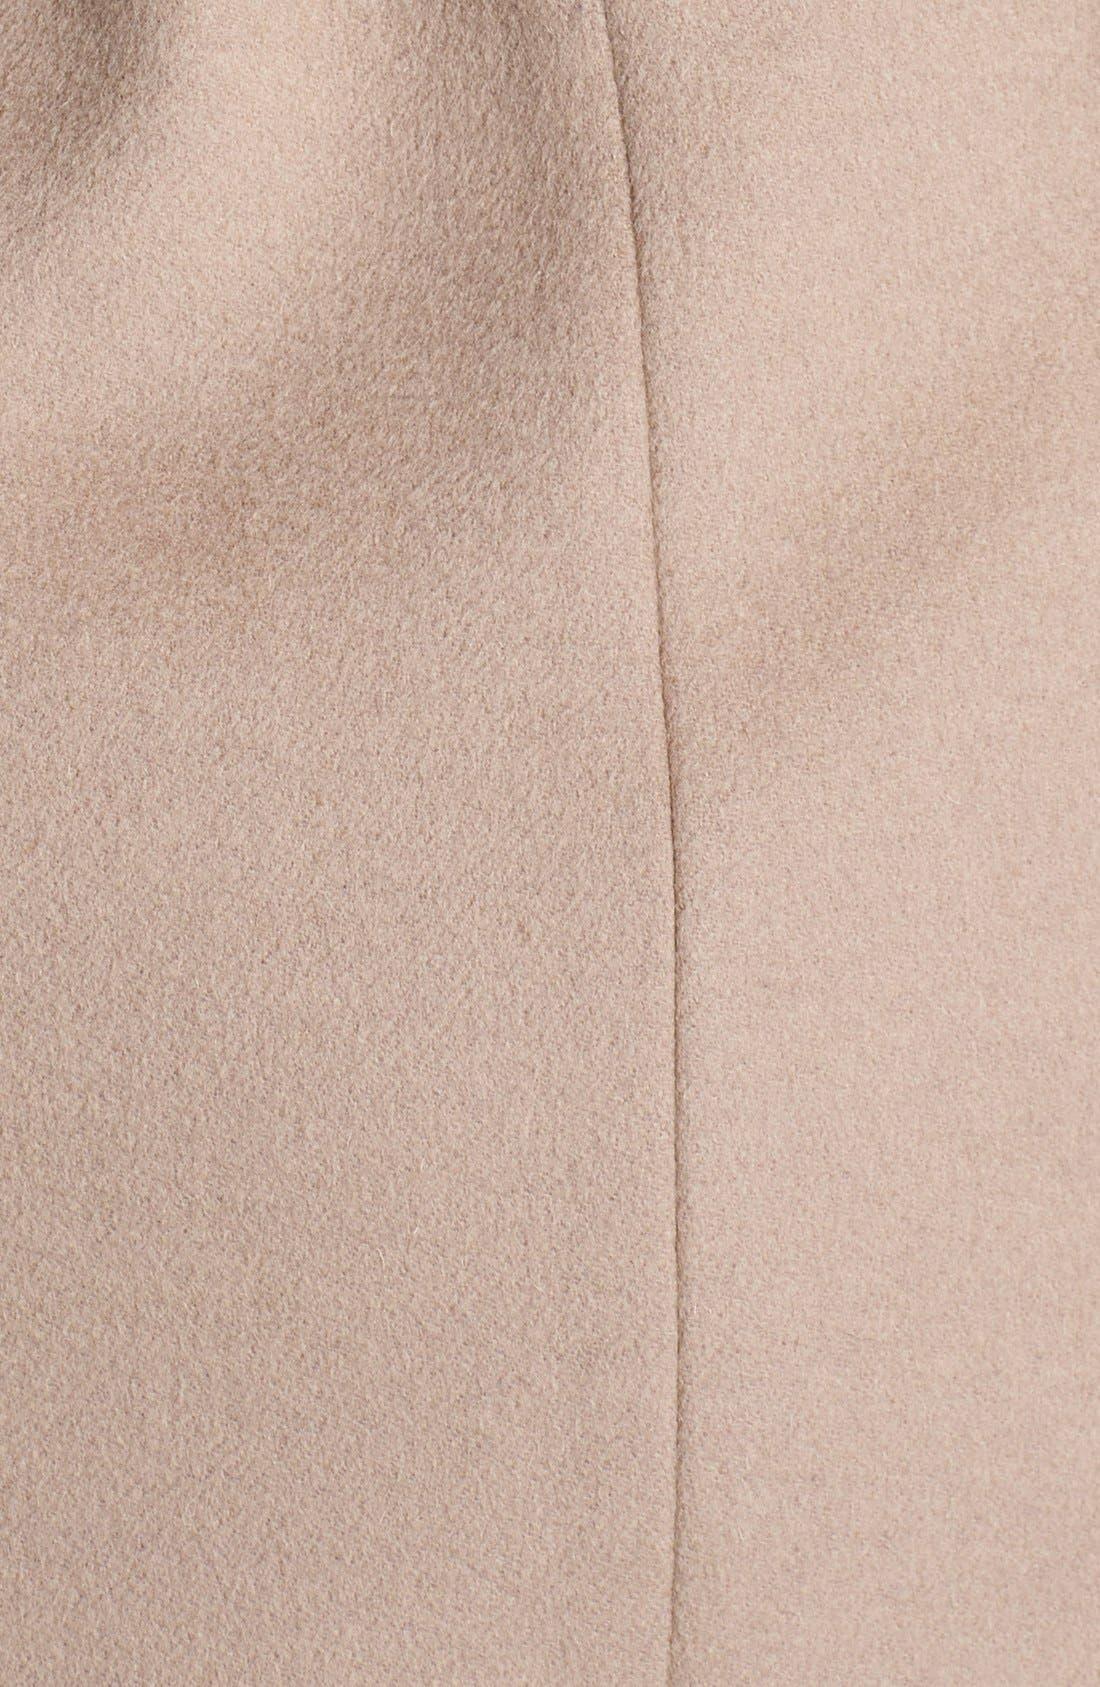 'Chelsea' Wool Blend Wrap Coat,                             Alternate thumbnail 2, color,                             263